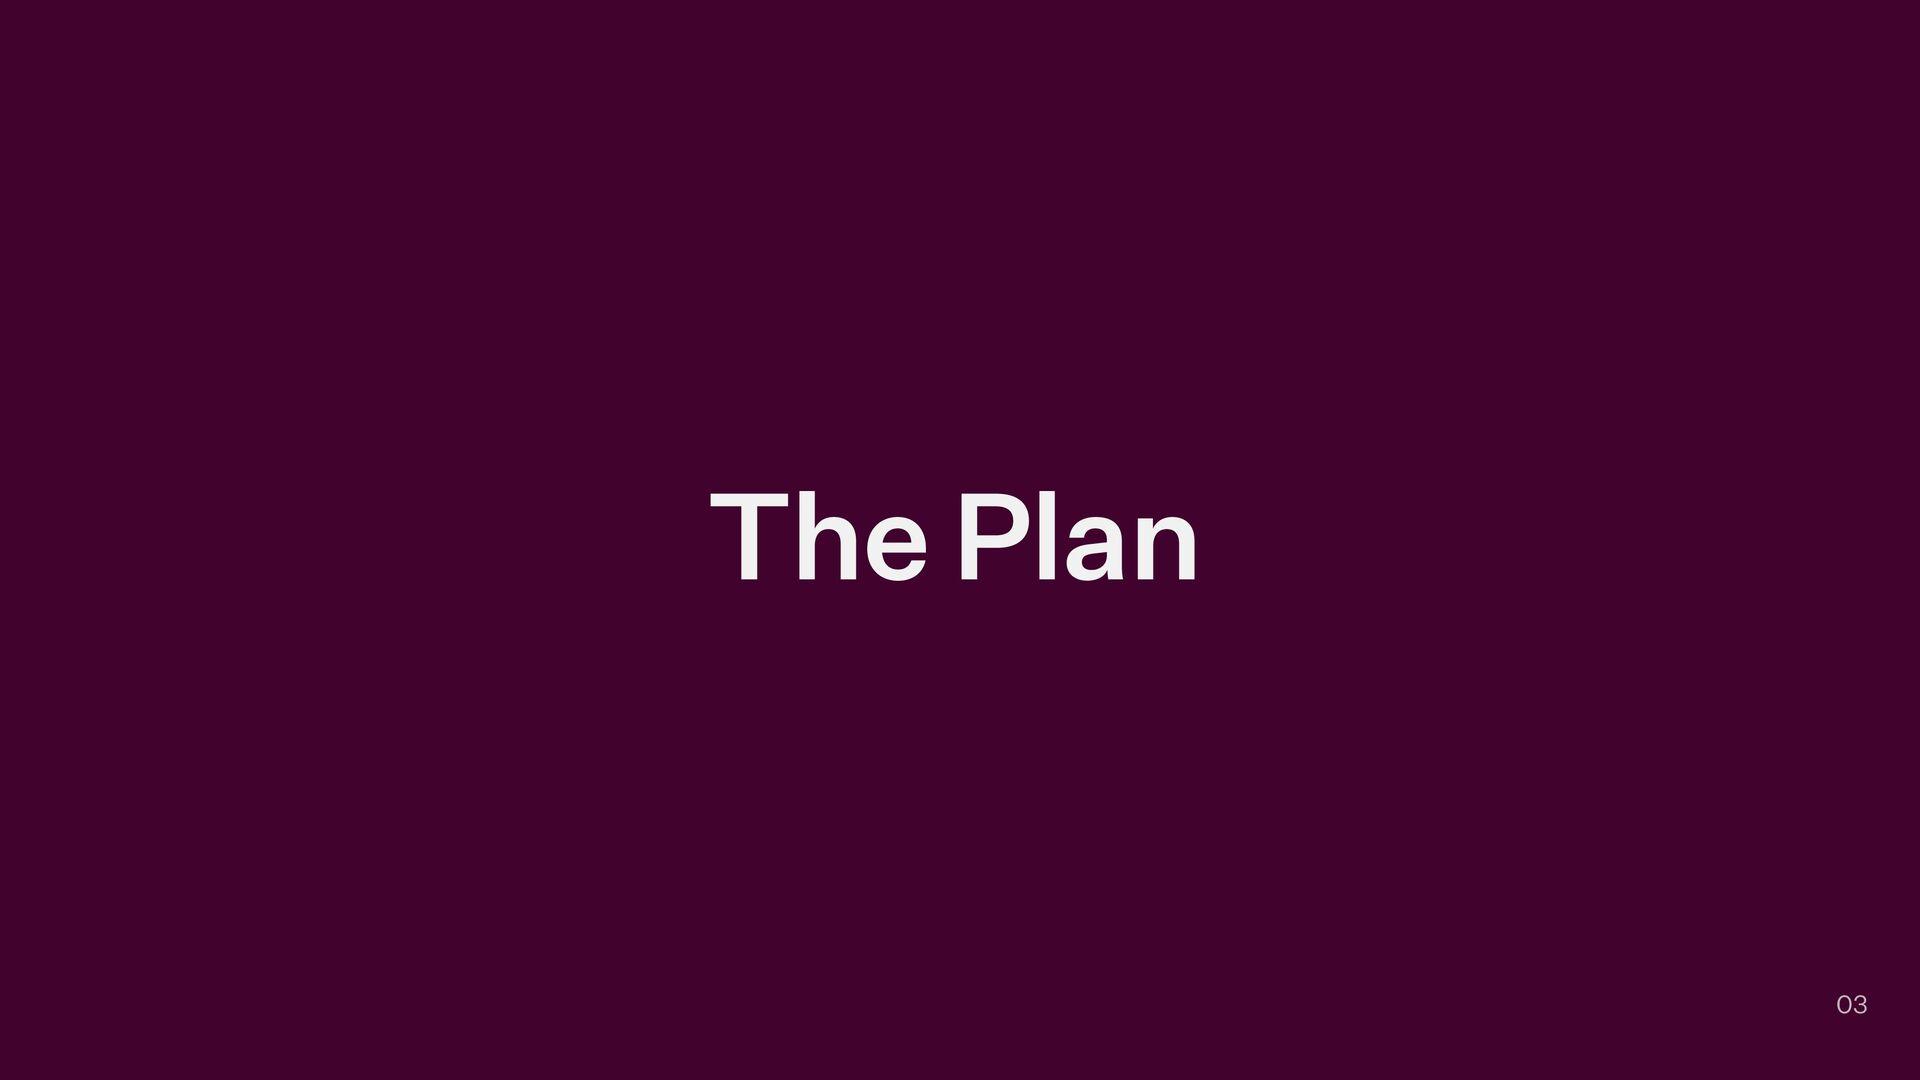 The Plan 03